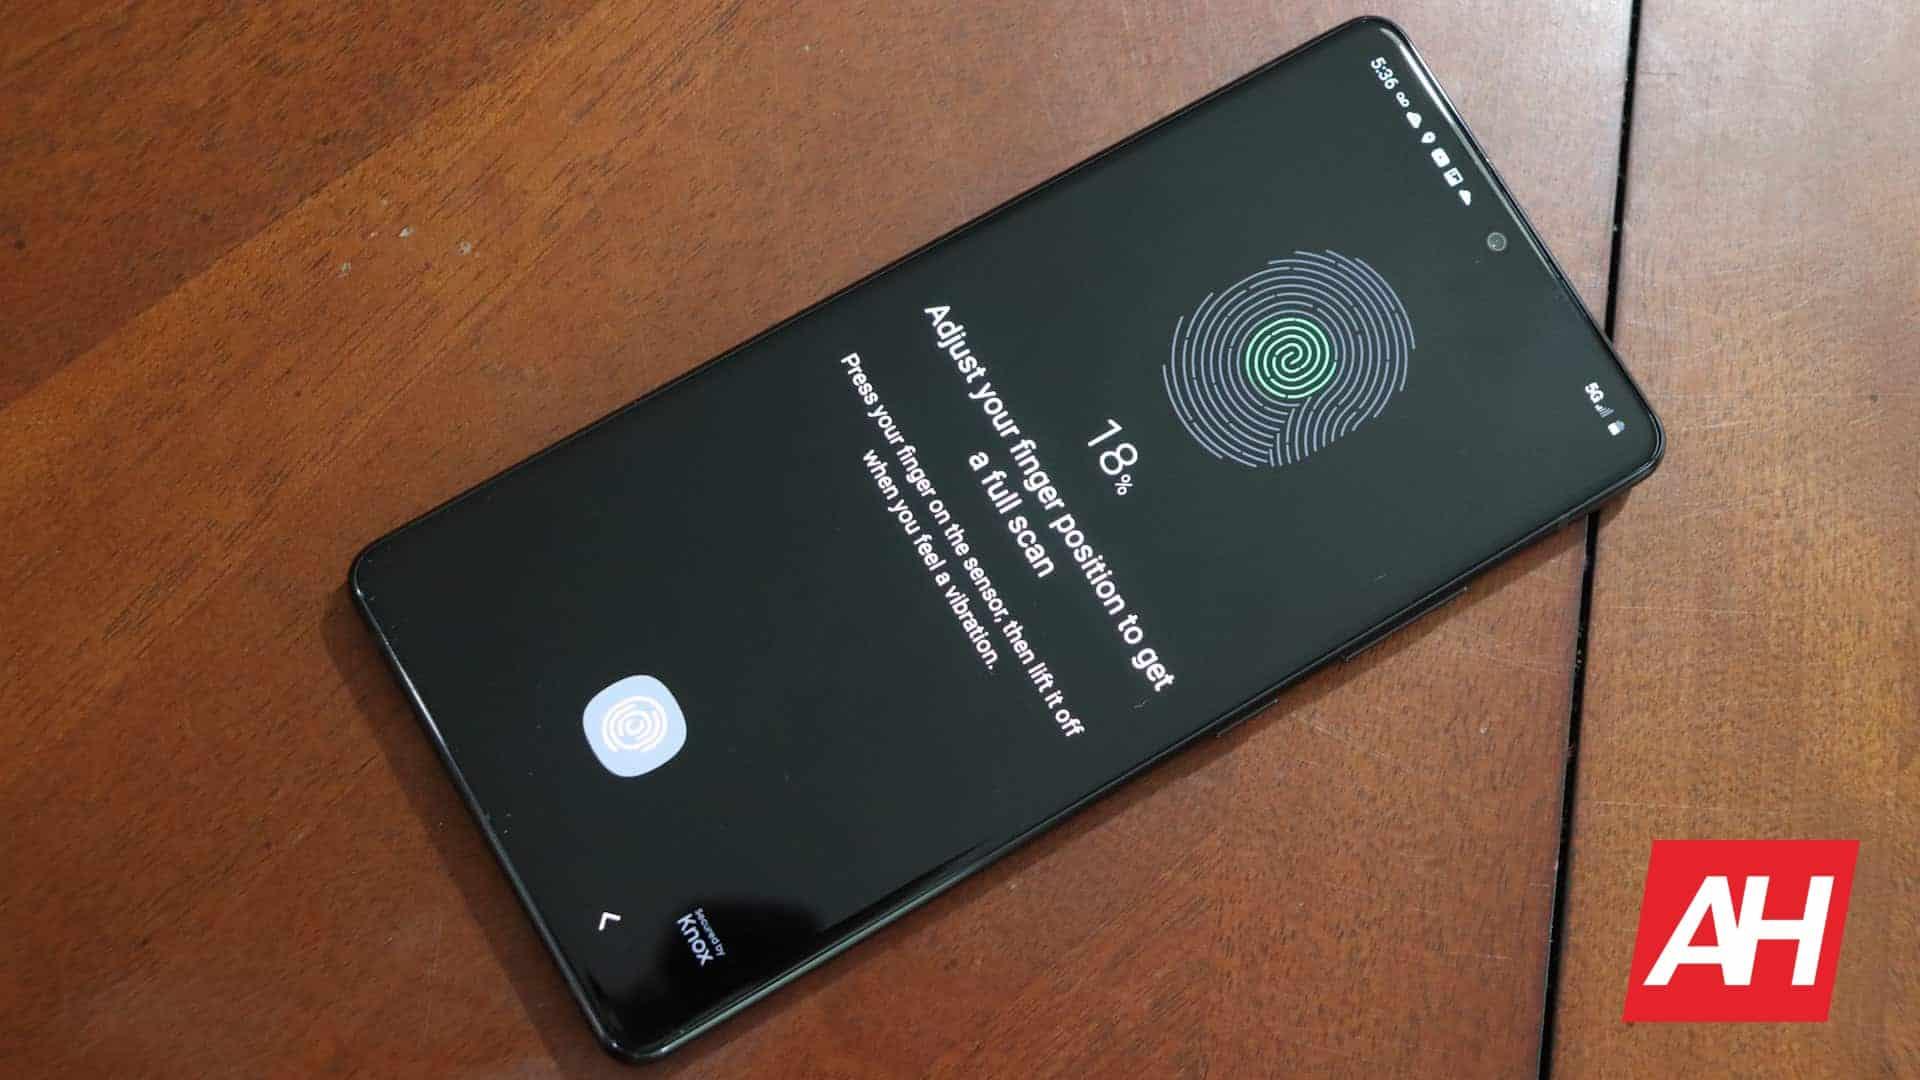 01 5 Samsung Galaxy A71 5G Hardware Review AH 2020